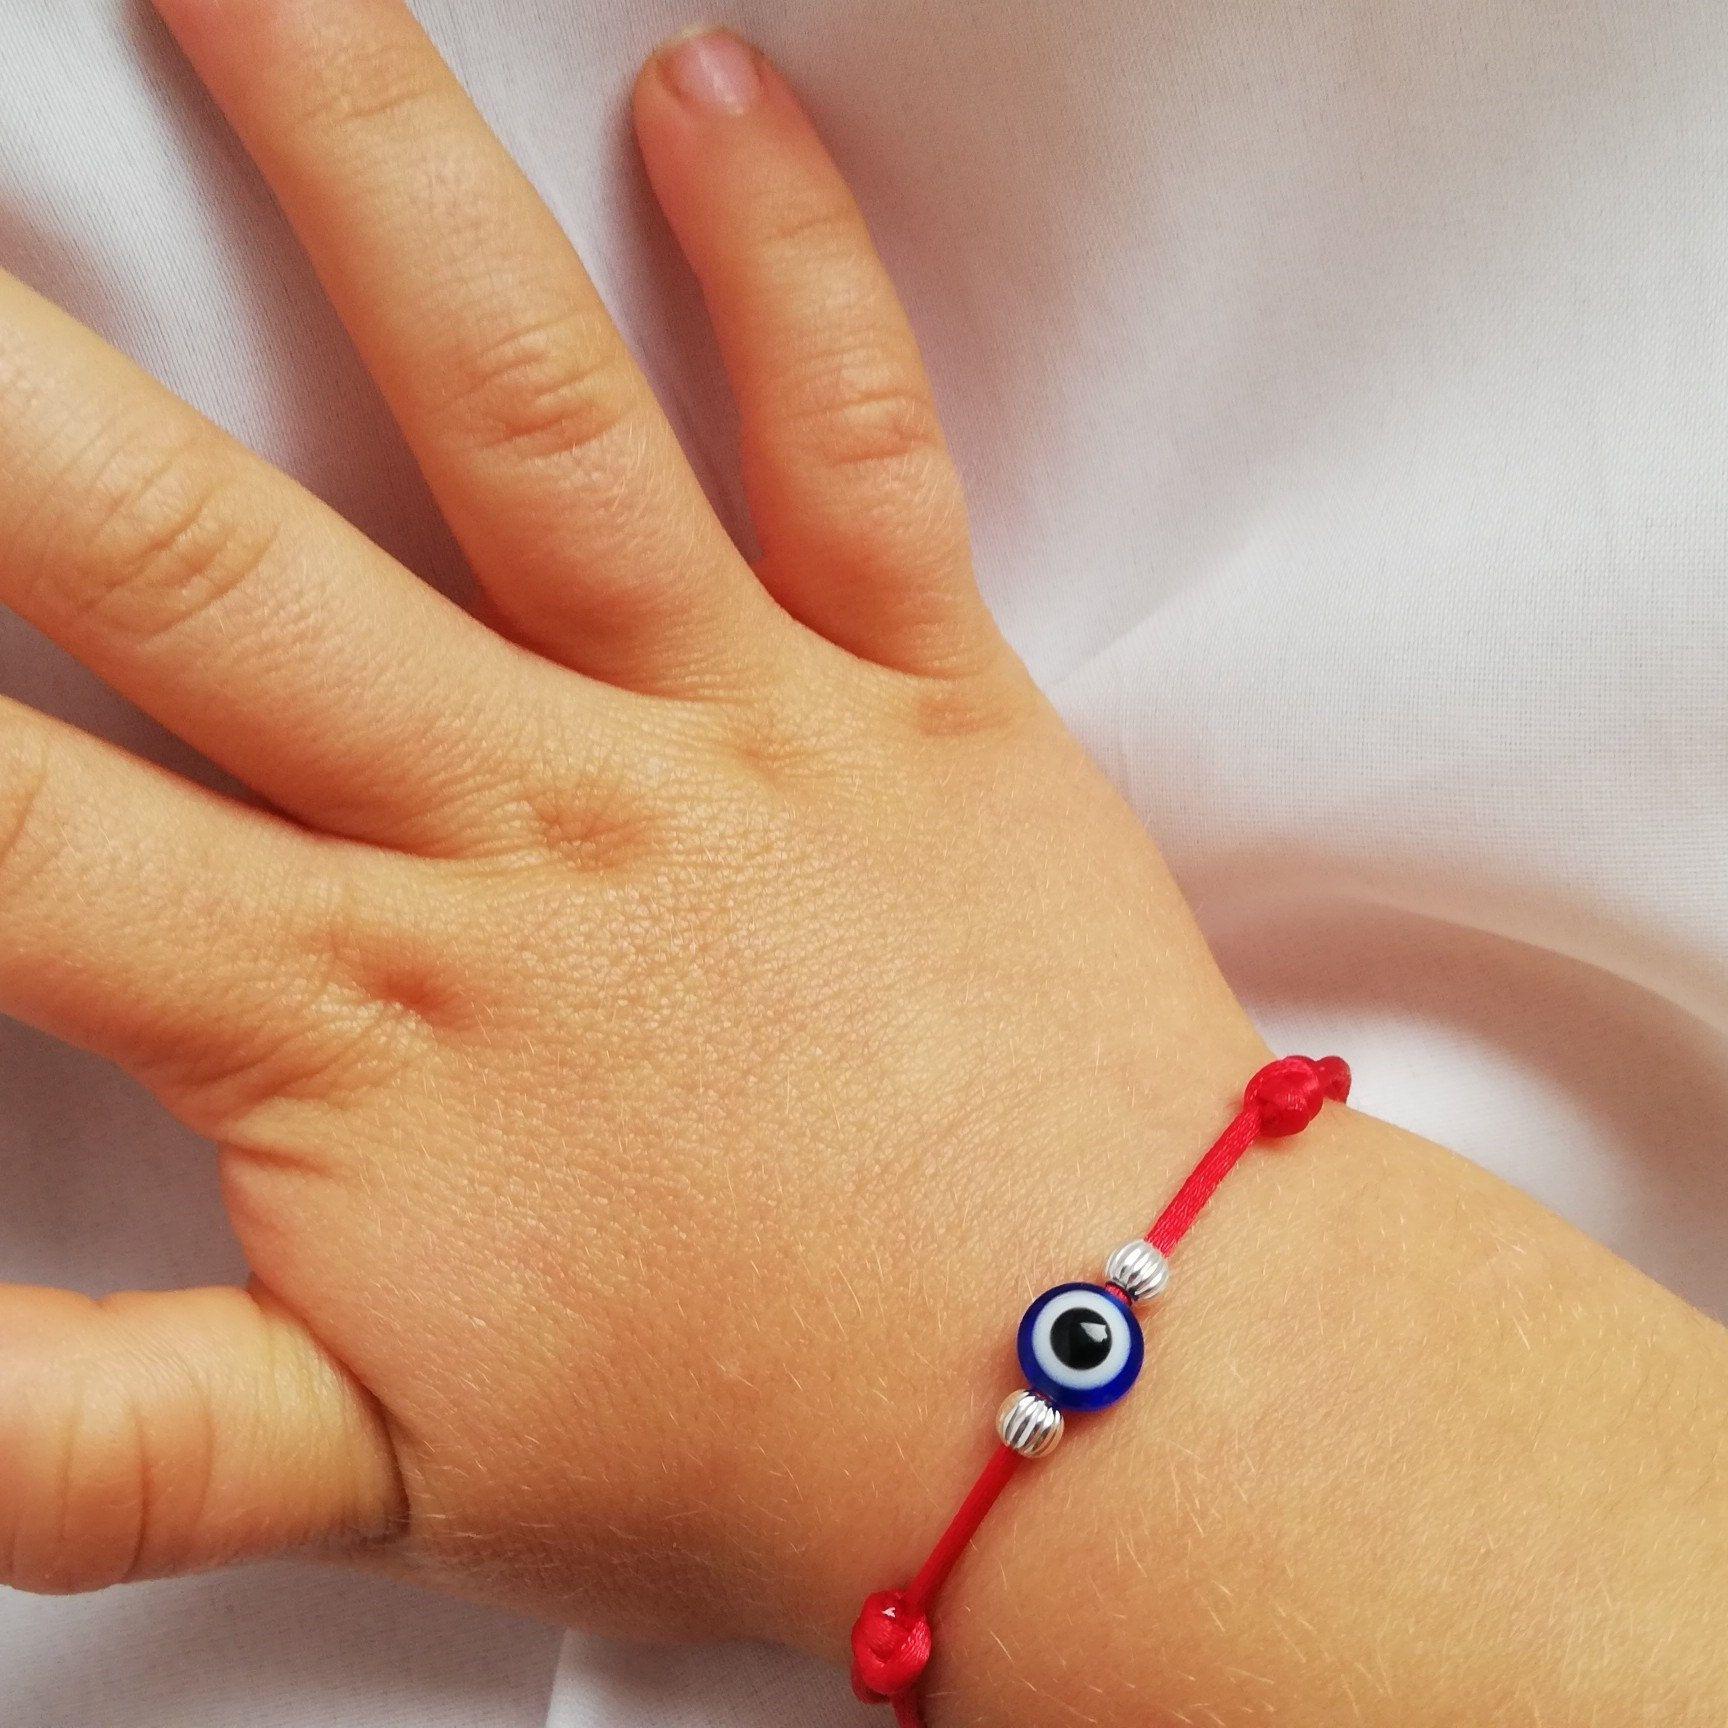 Amulet Red String Kabbalah Red Bracelet Lucky Eye Bracelet Red Bracelet Blue Evil Eye Red String Protection Bracelet